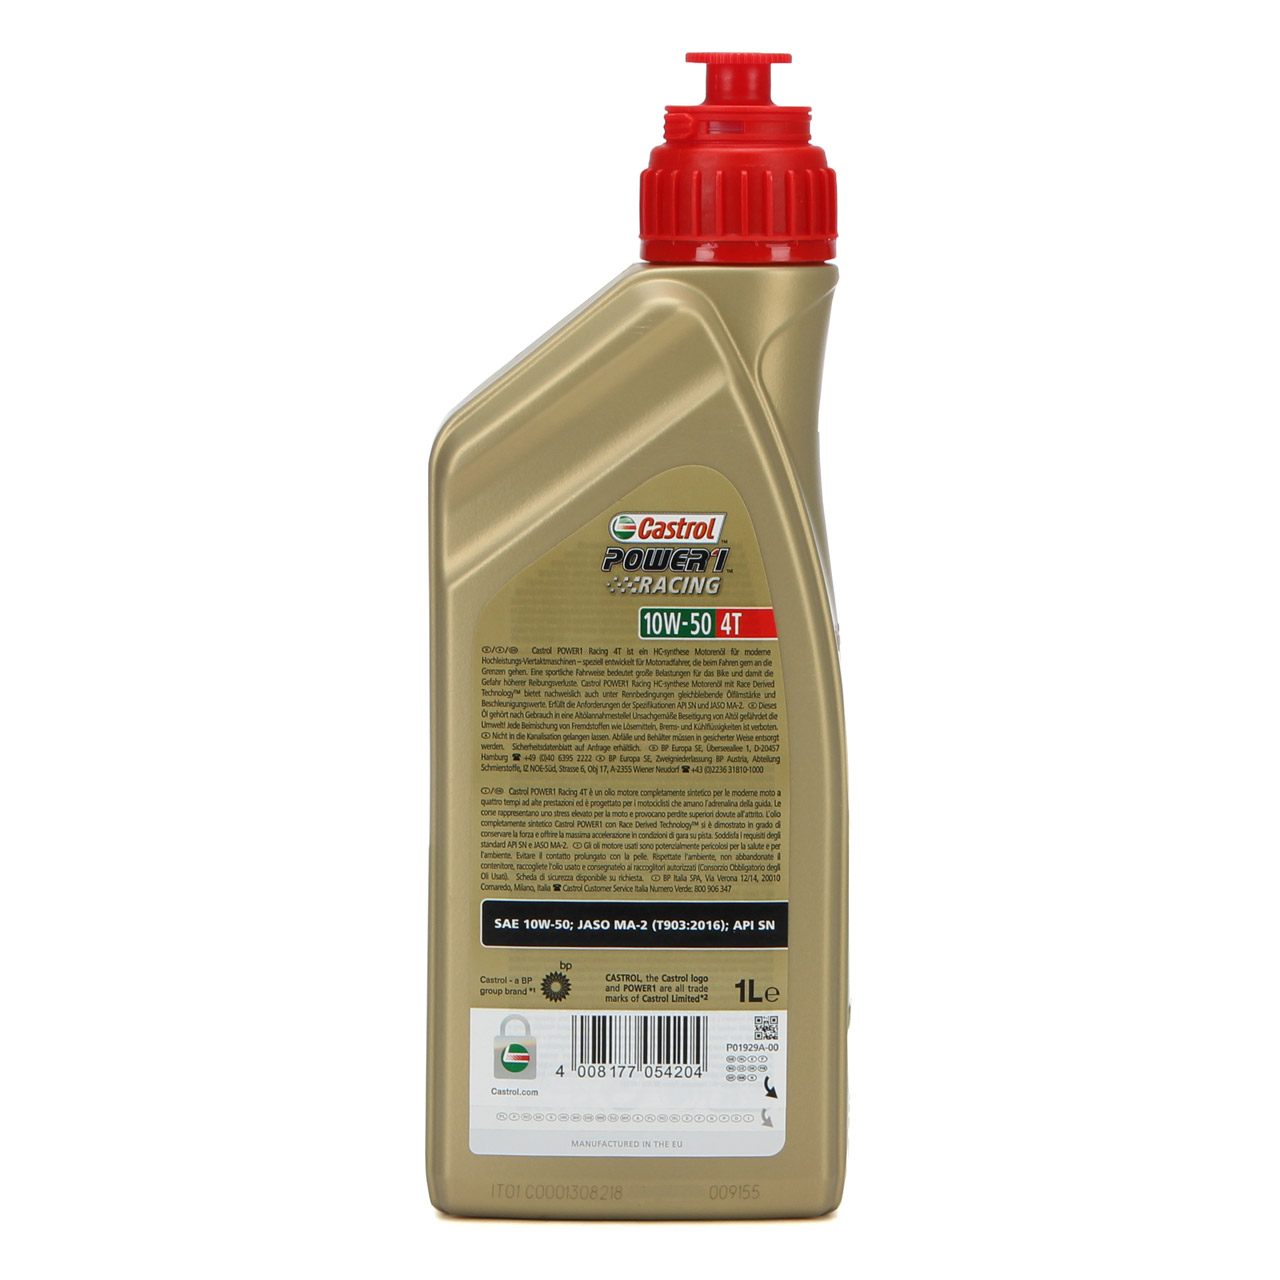 1L 1 Liter CASTROL Motoröl Öl POWER 1 RACING 4T 4-TAKT 10W50 JASO MA-2 API SN